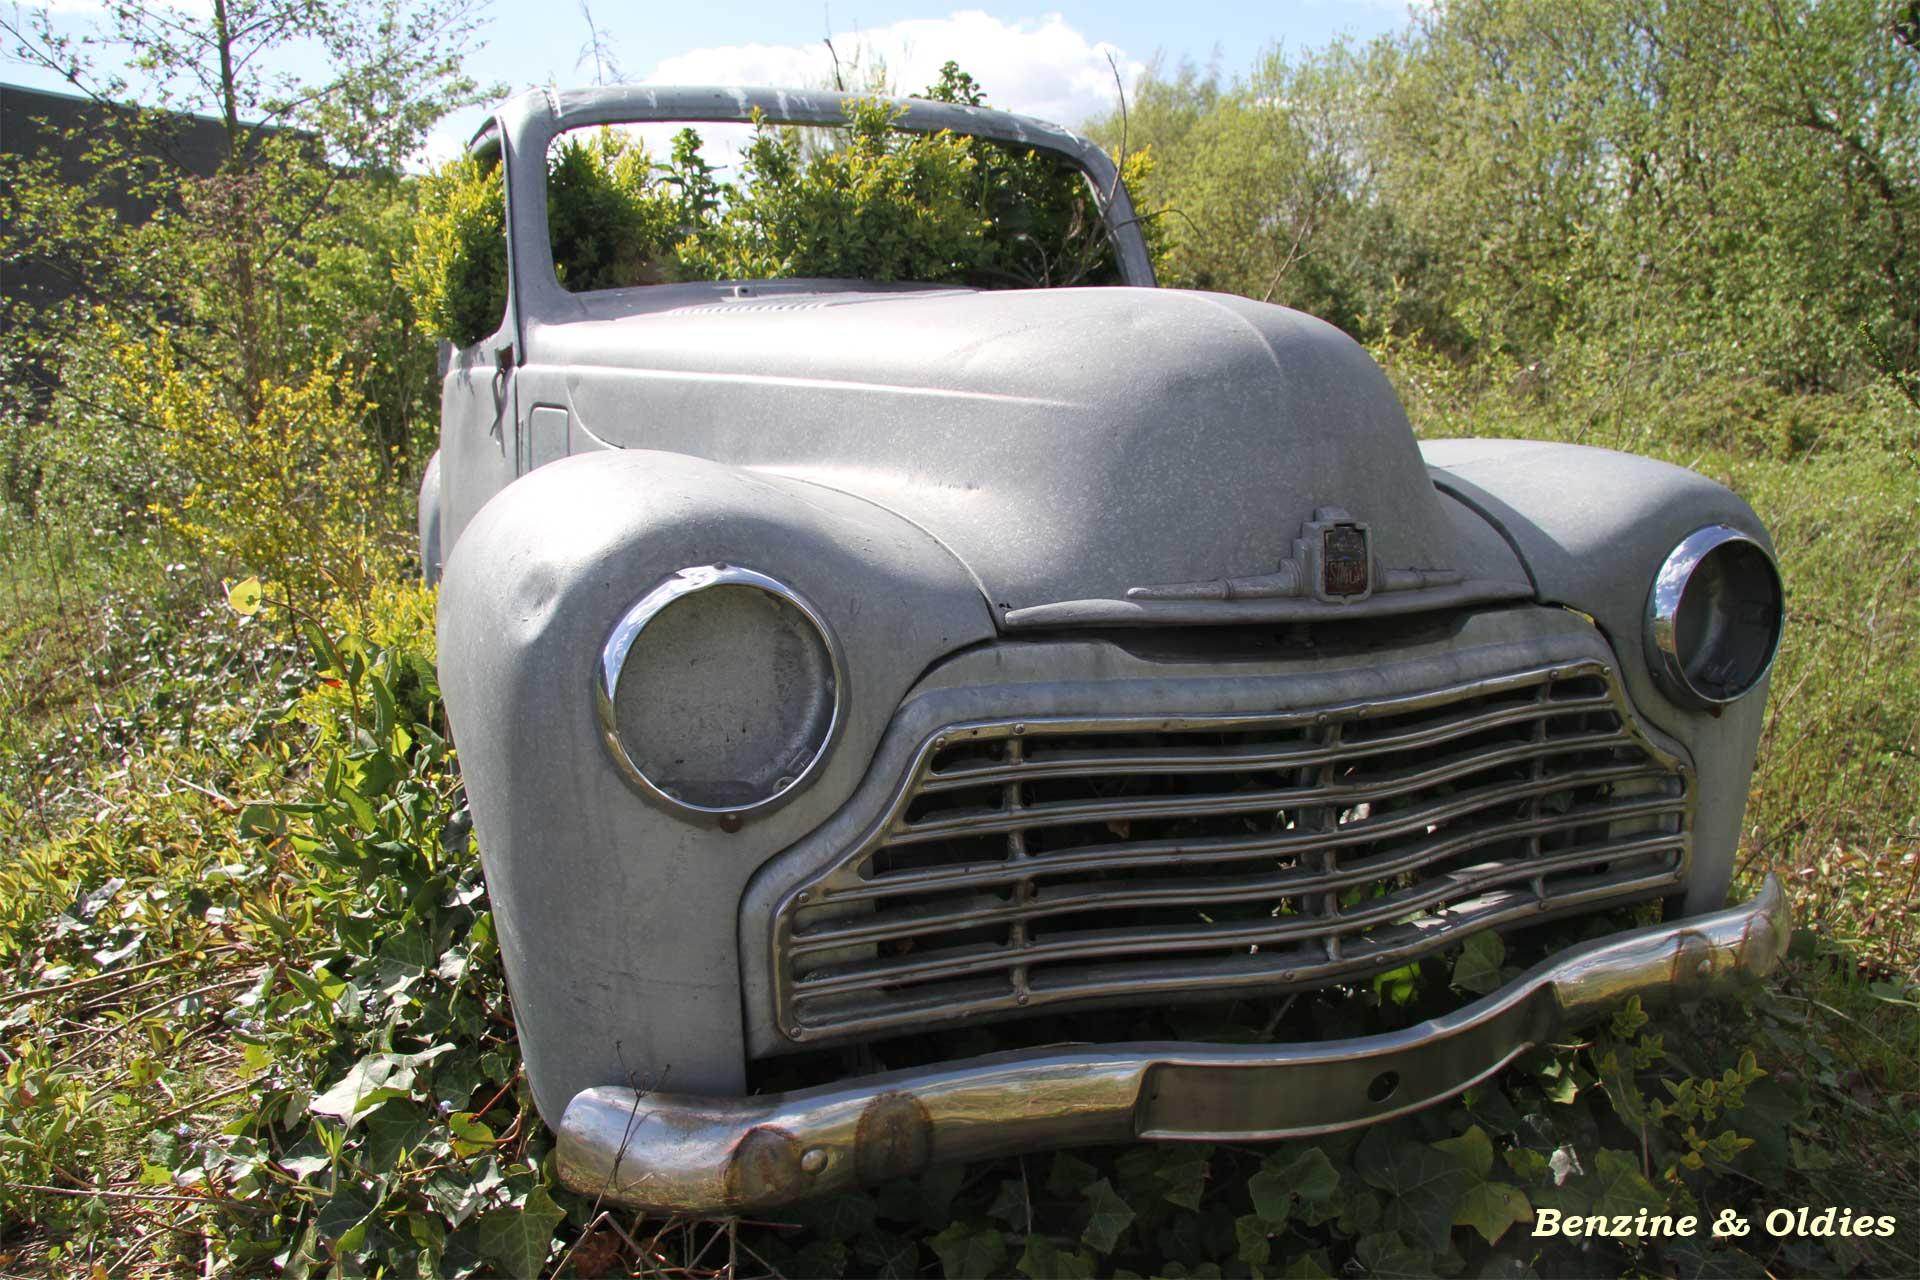 une Simca 6 carrosserie aluminium oubliée dans la nature - Simca6 901186simca6street30w19201280